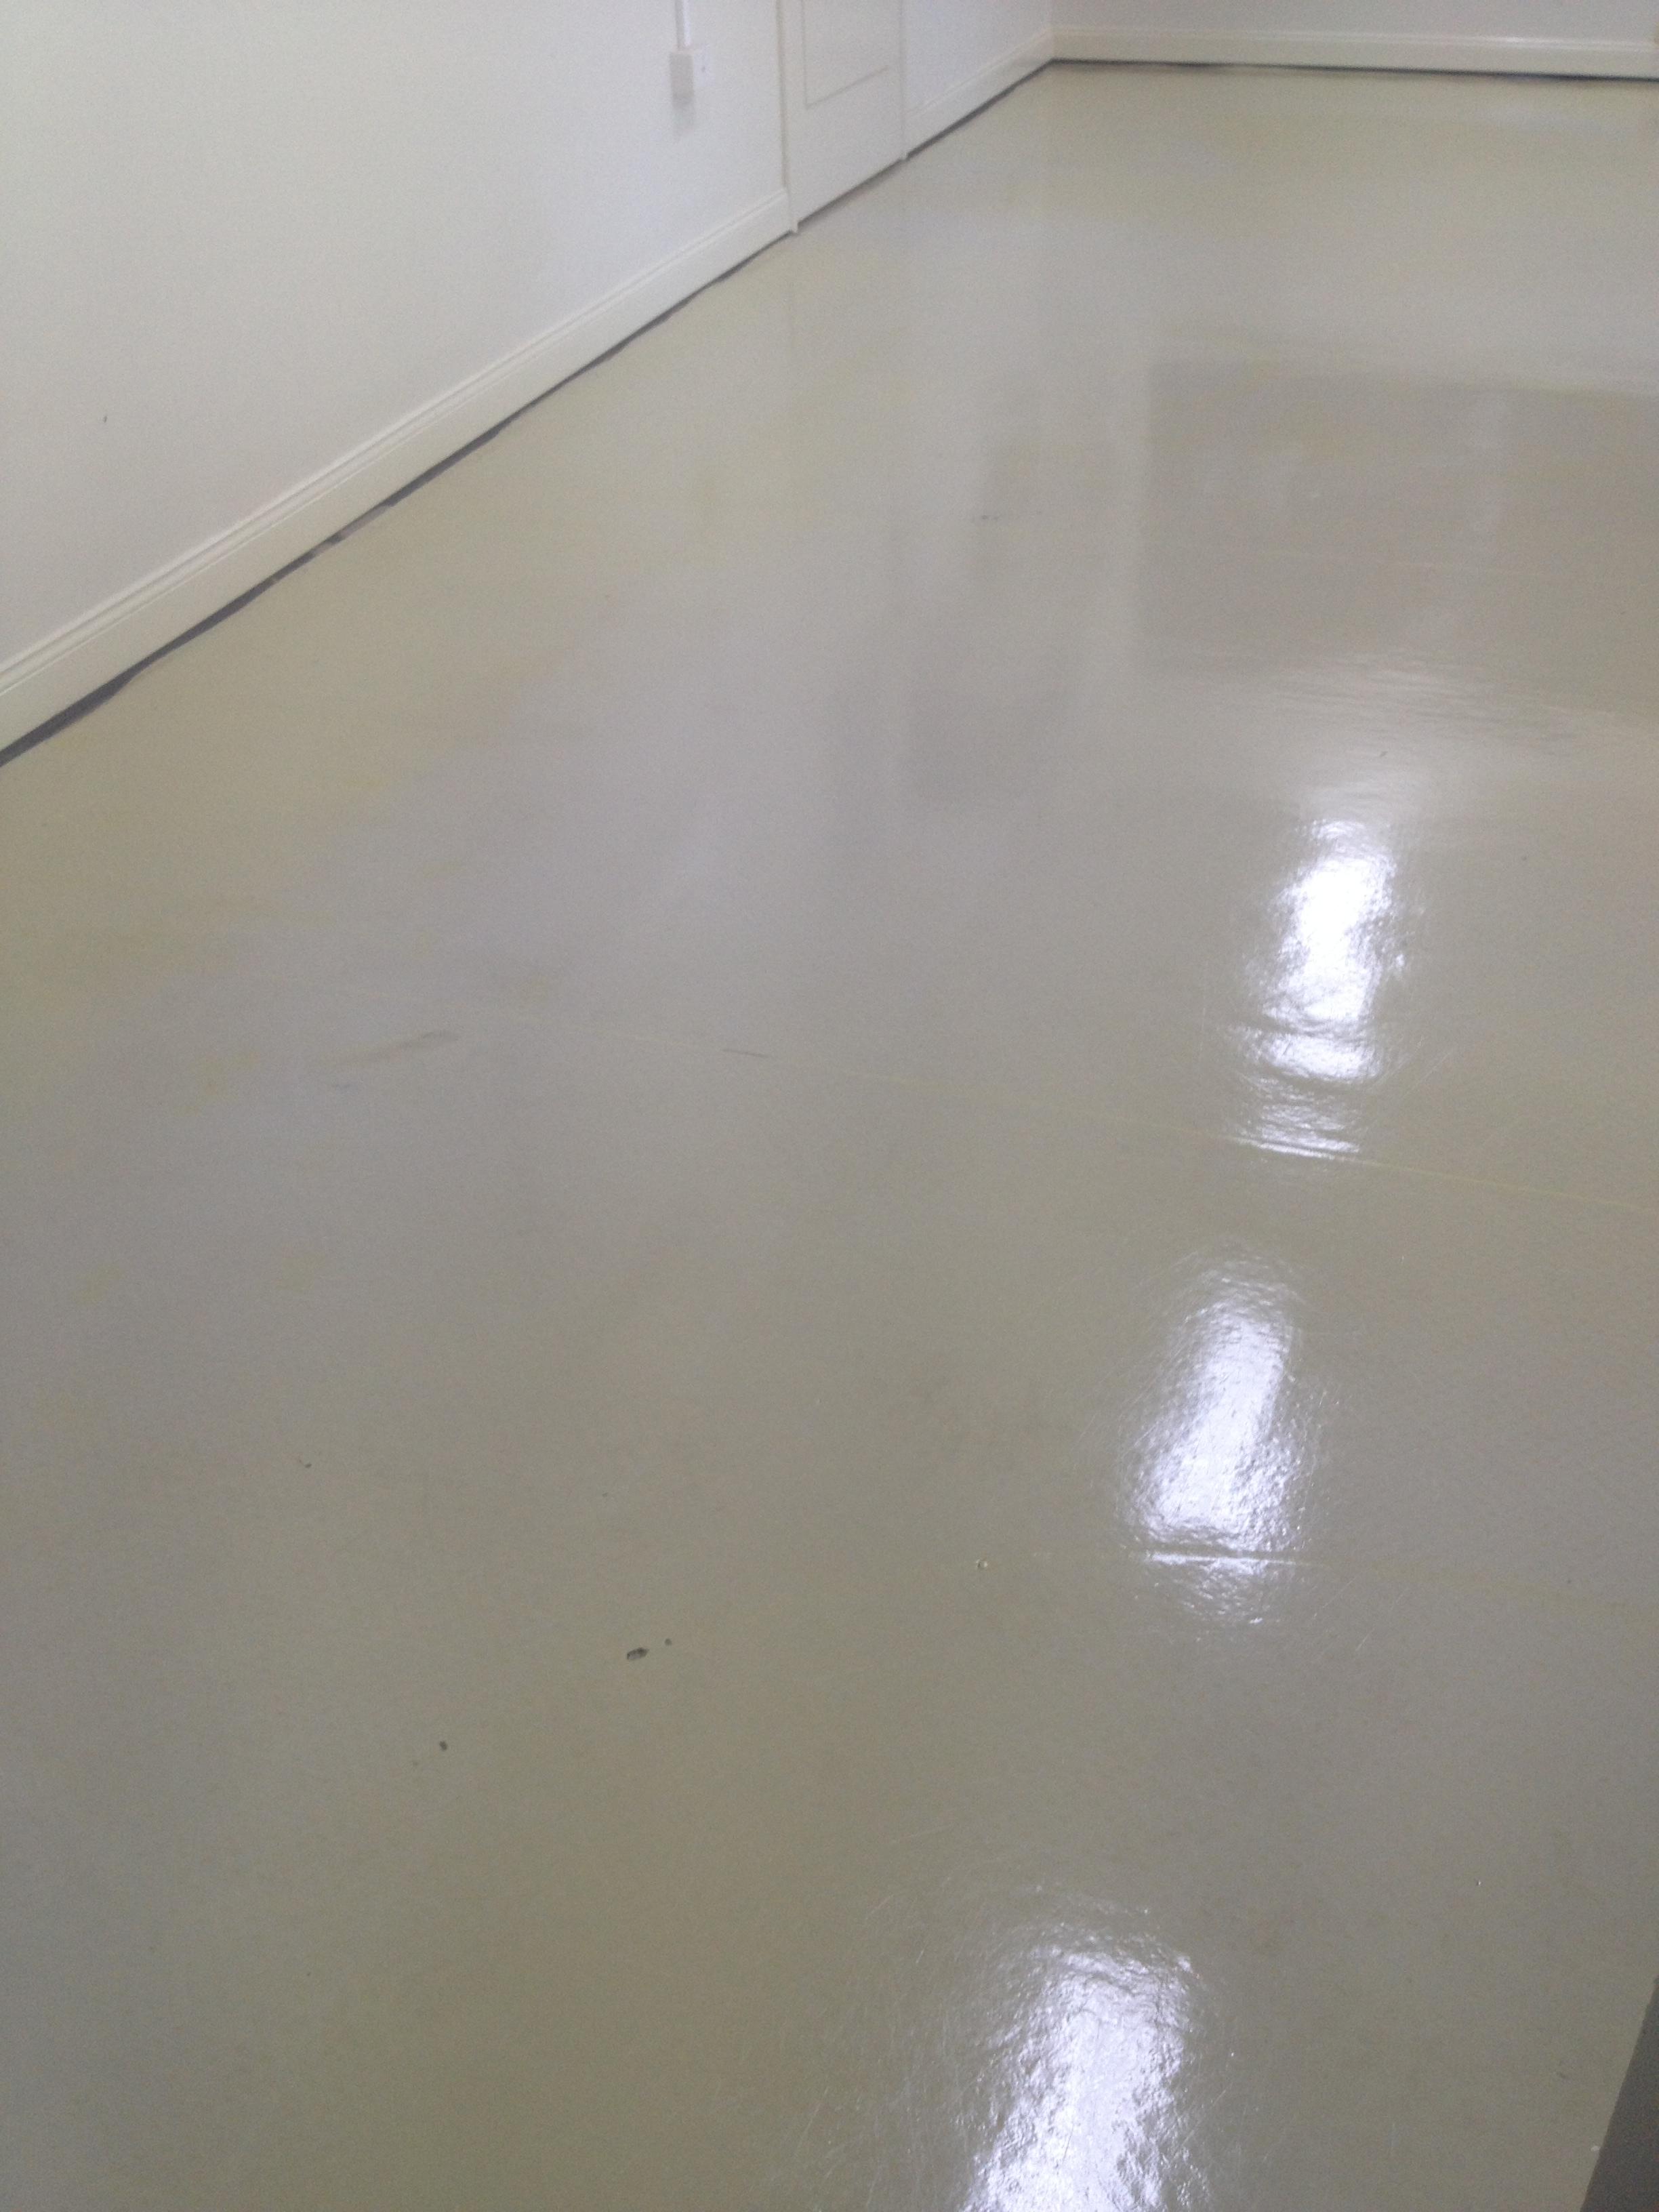 Vinyl Striping Sealing All Carpet Care Gold Coast Carpet - Professional linoleum floor cleaning